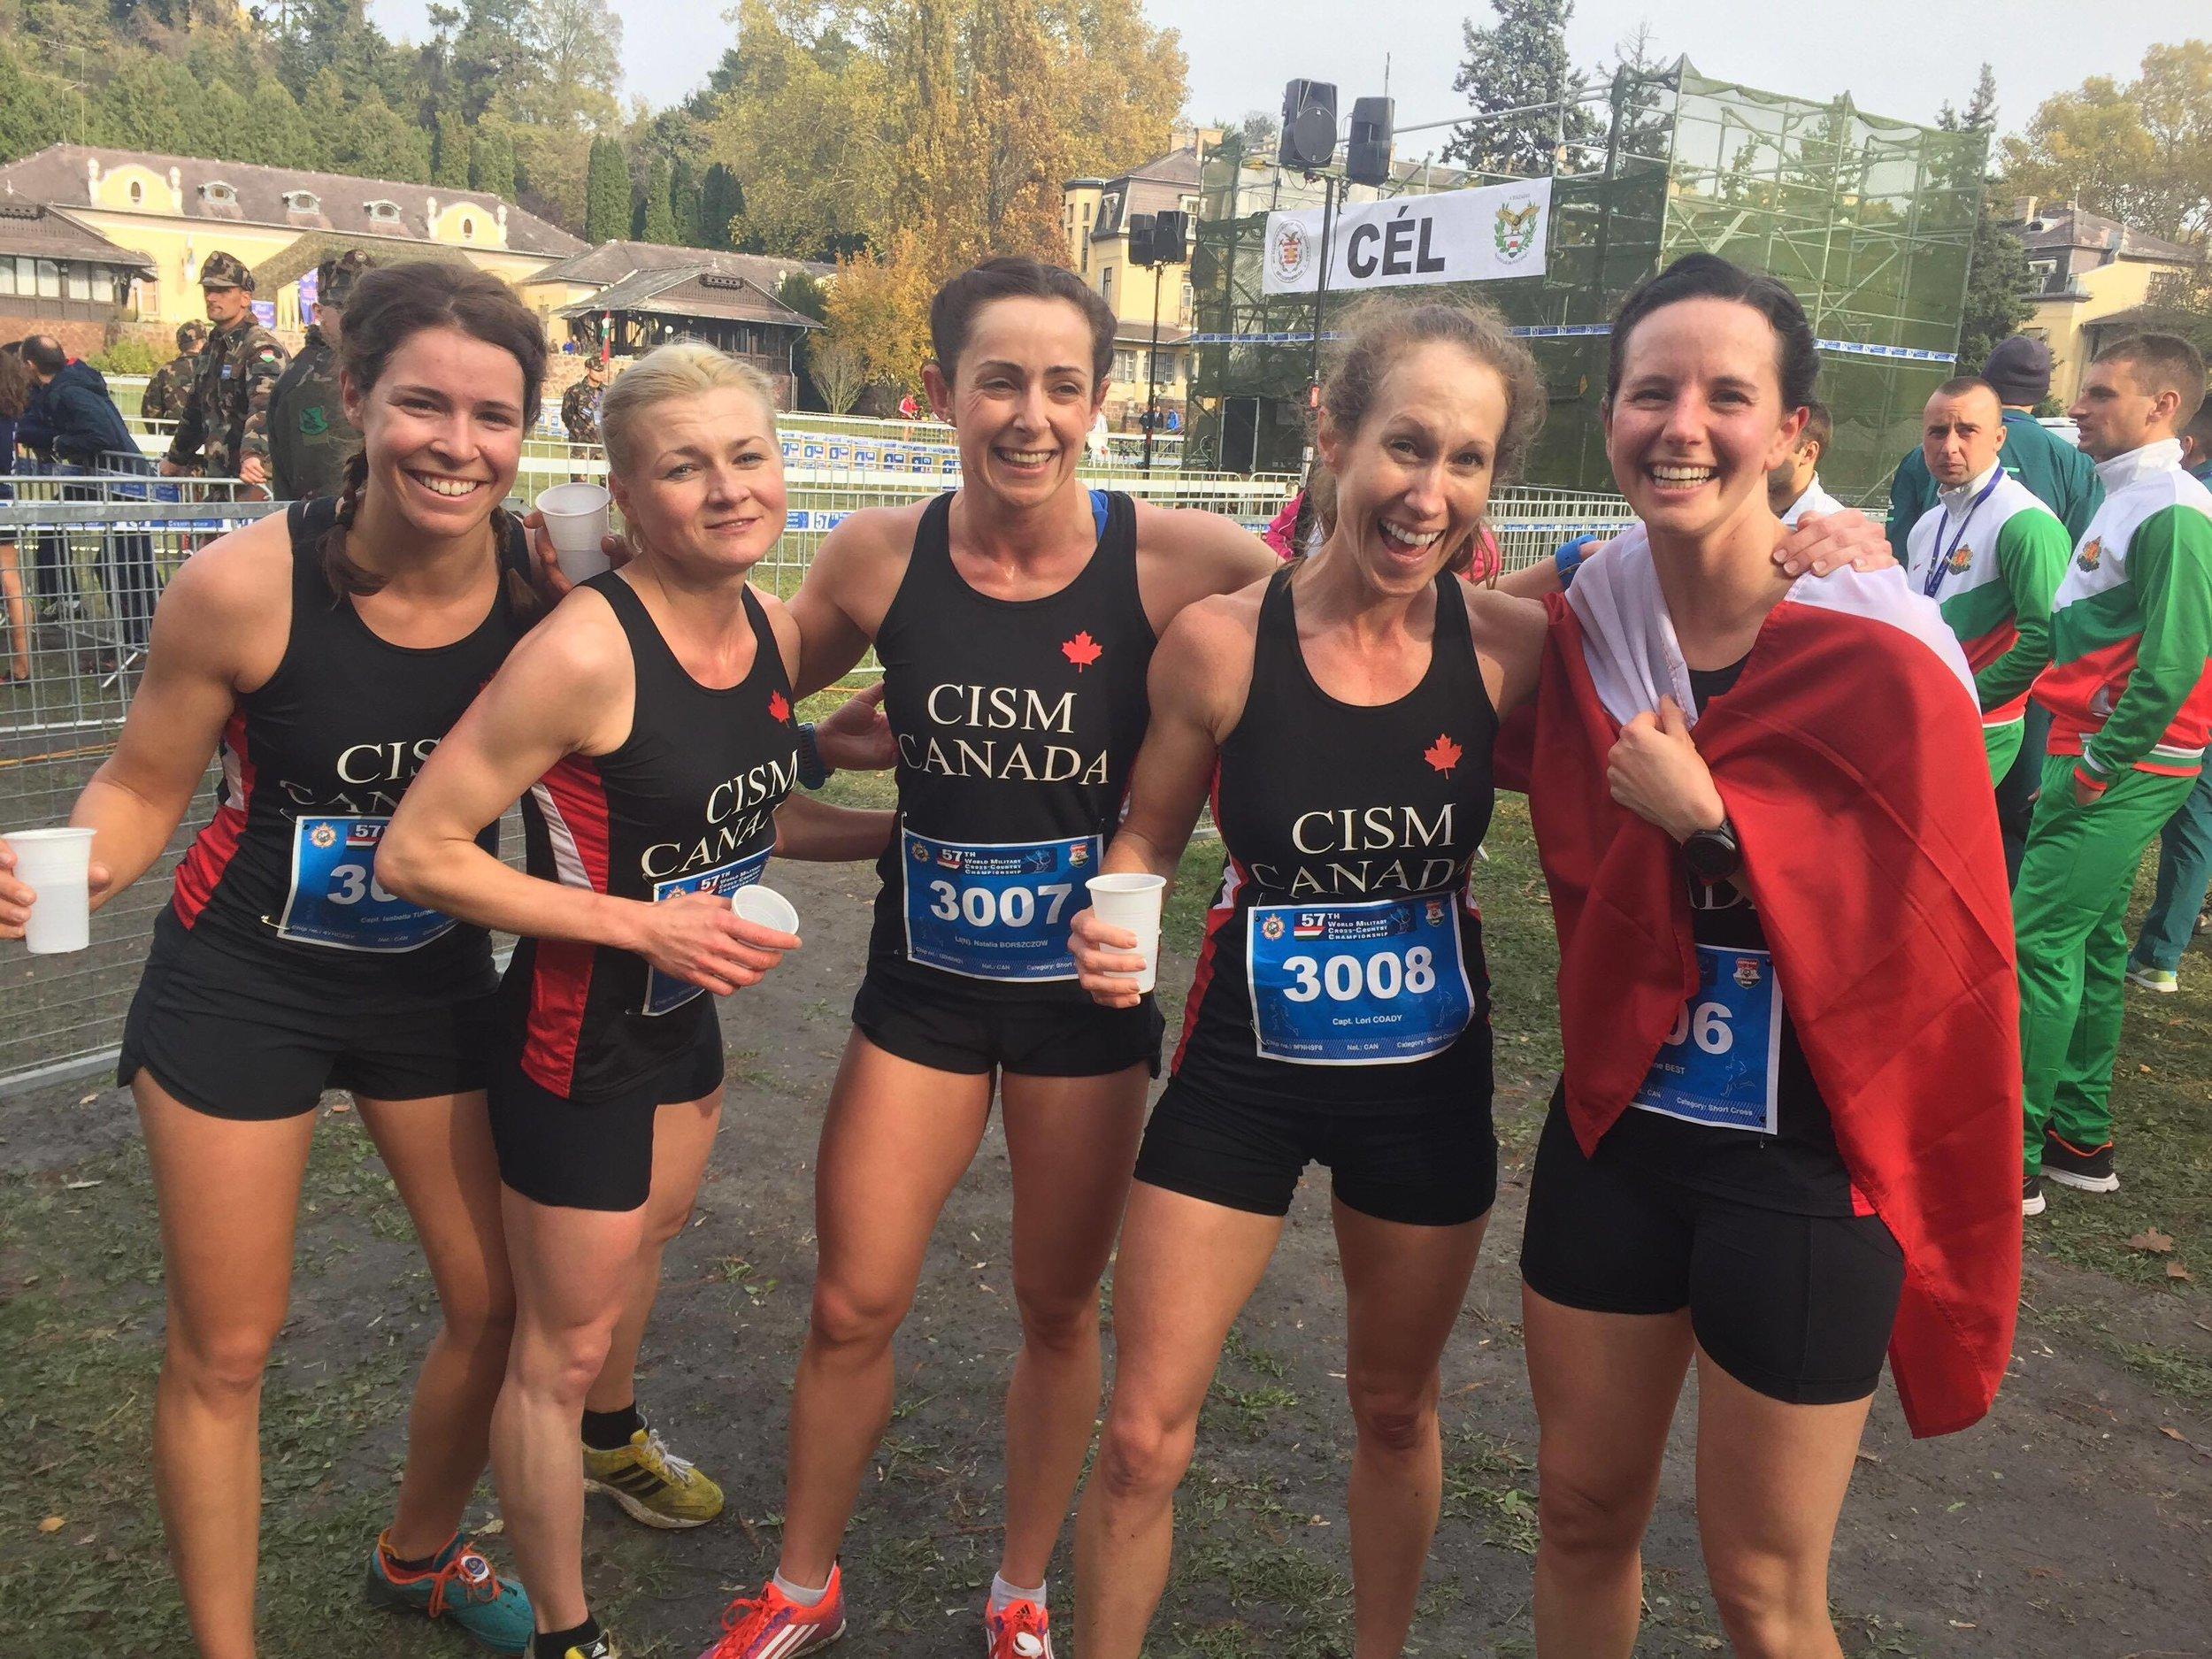 Short Course Female Team, L to R: Isabelle, Maria, Natalia, Lori and CJ.